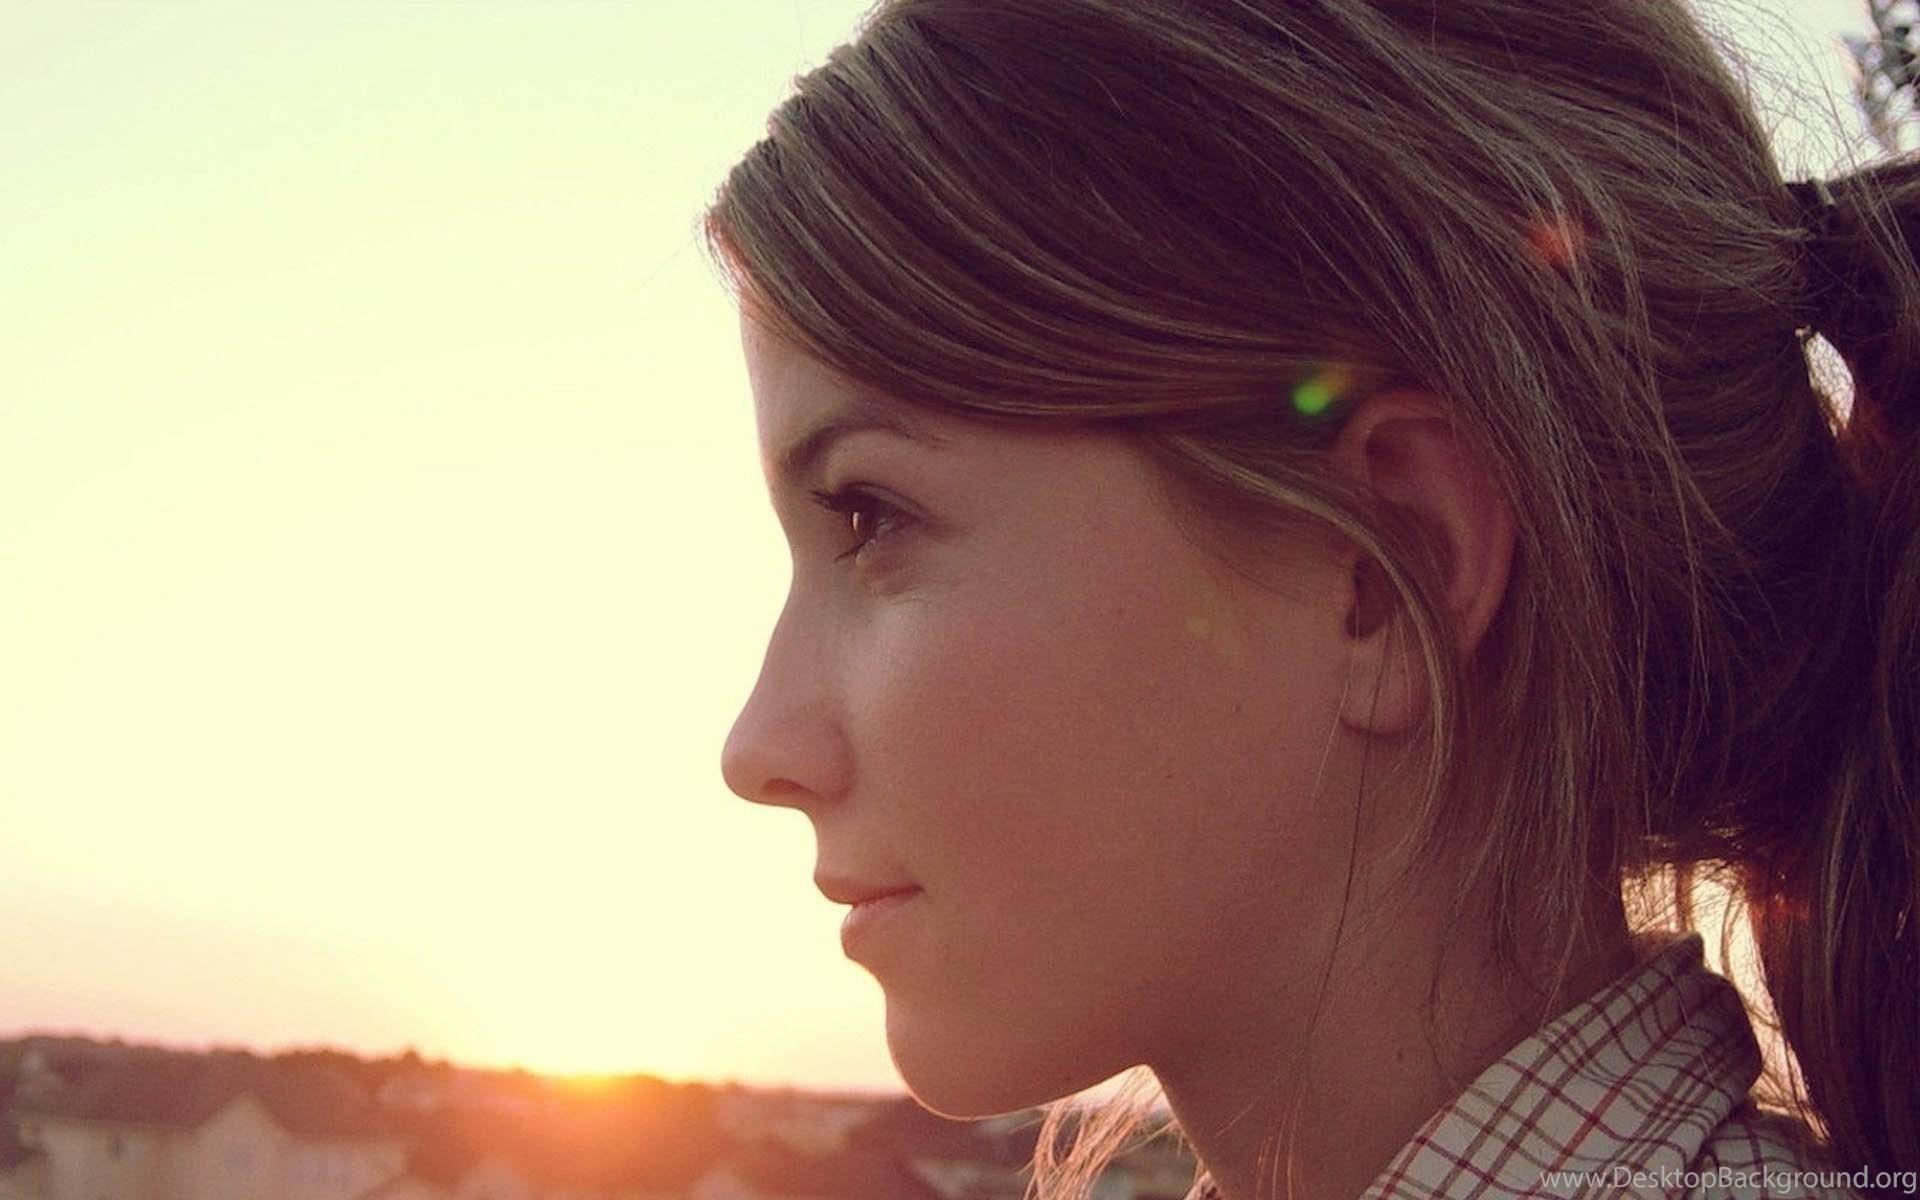 free download beautiful girls wallpapers desktop background